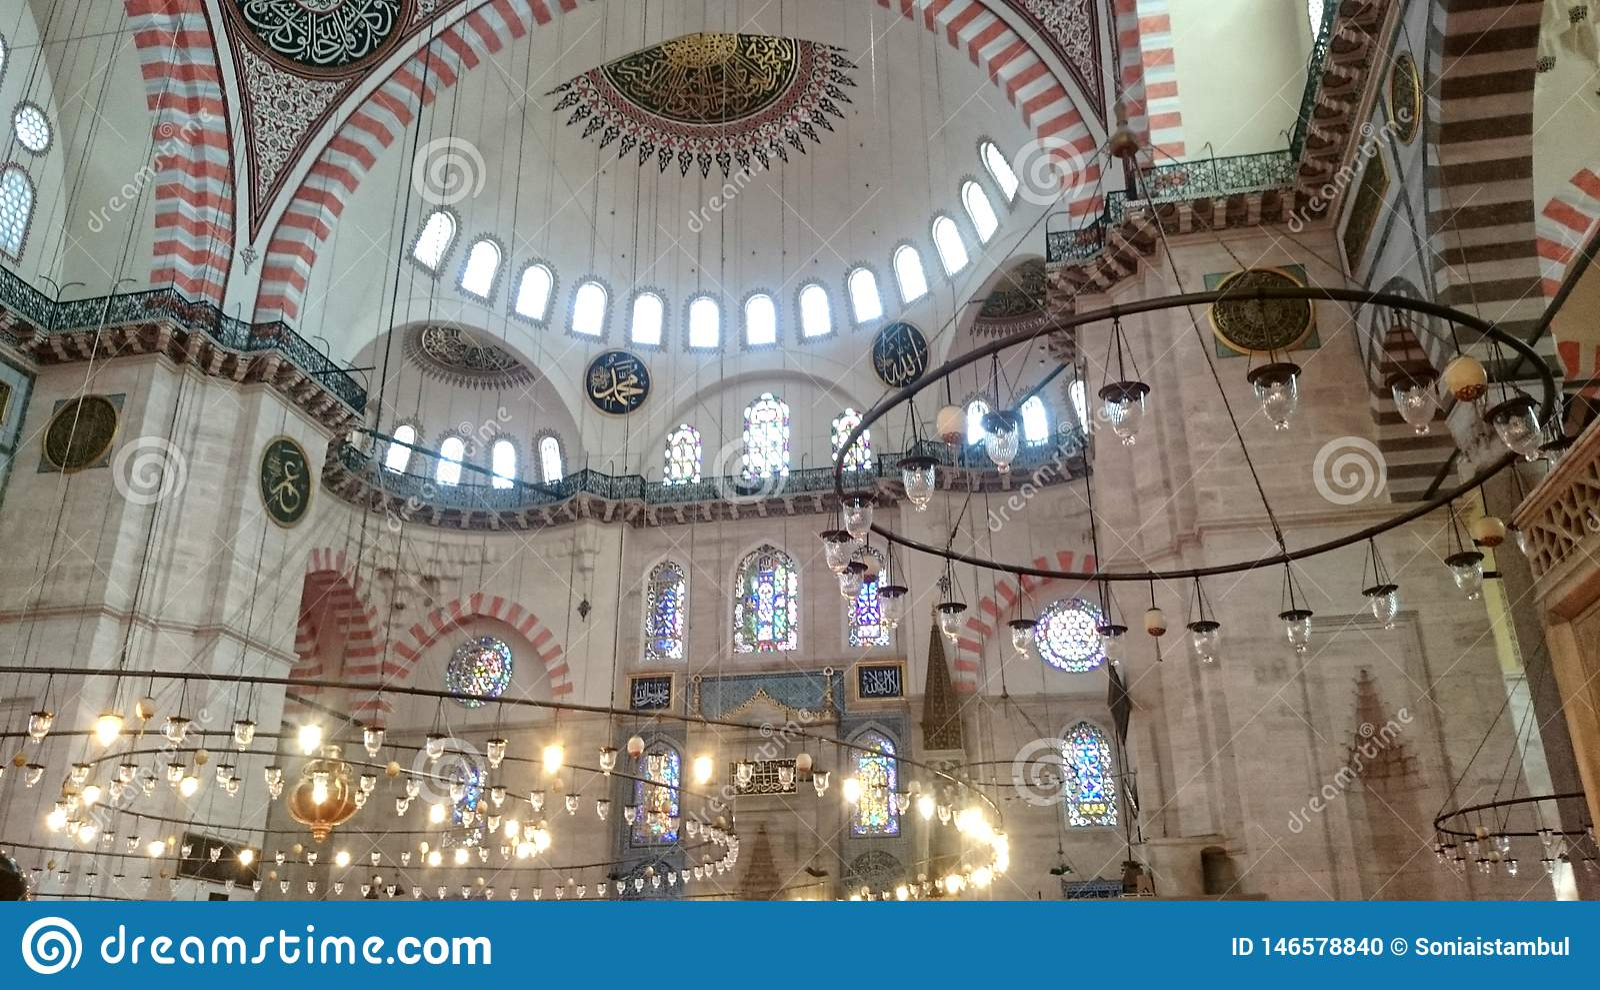 Suleyman moskee